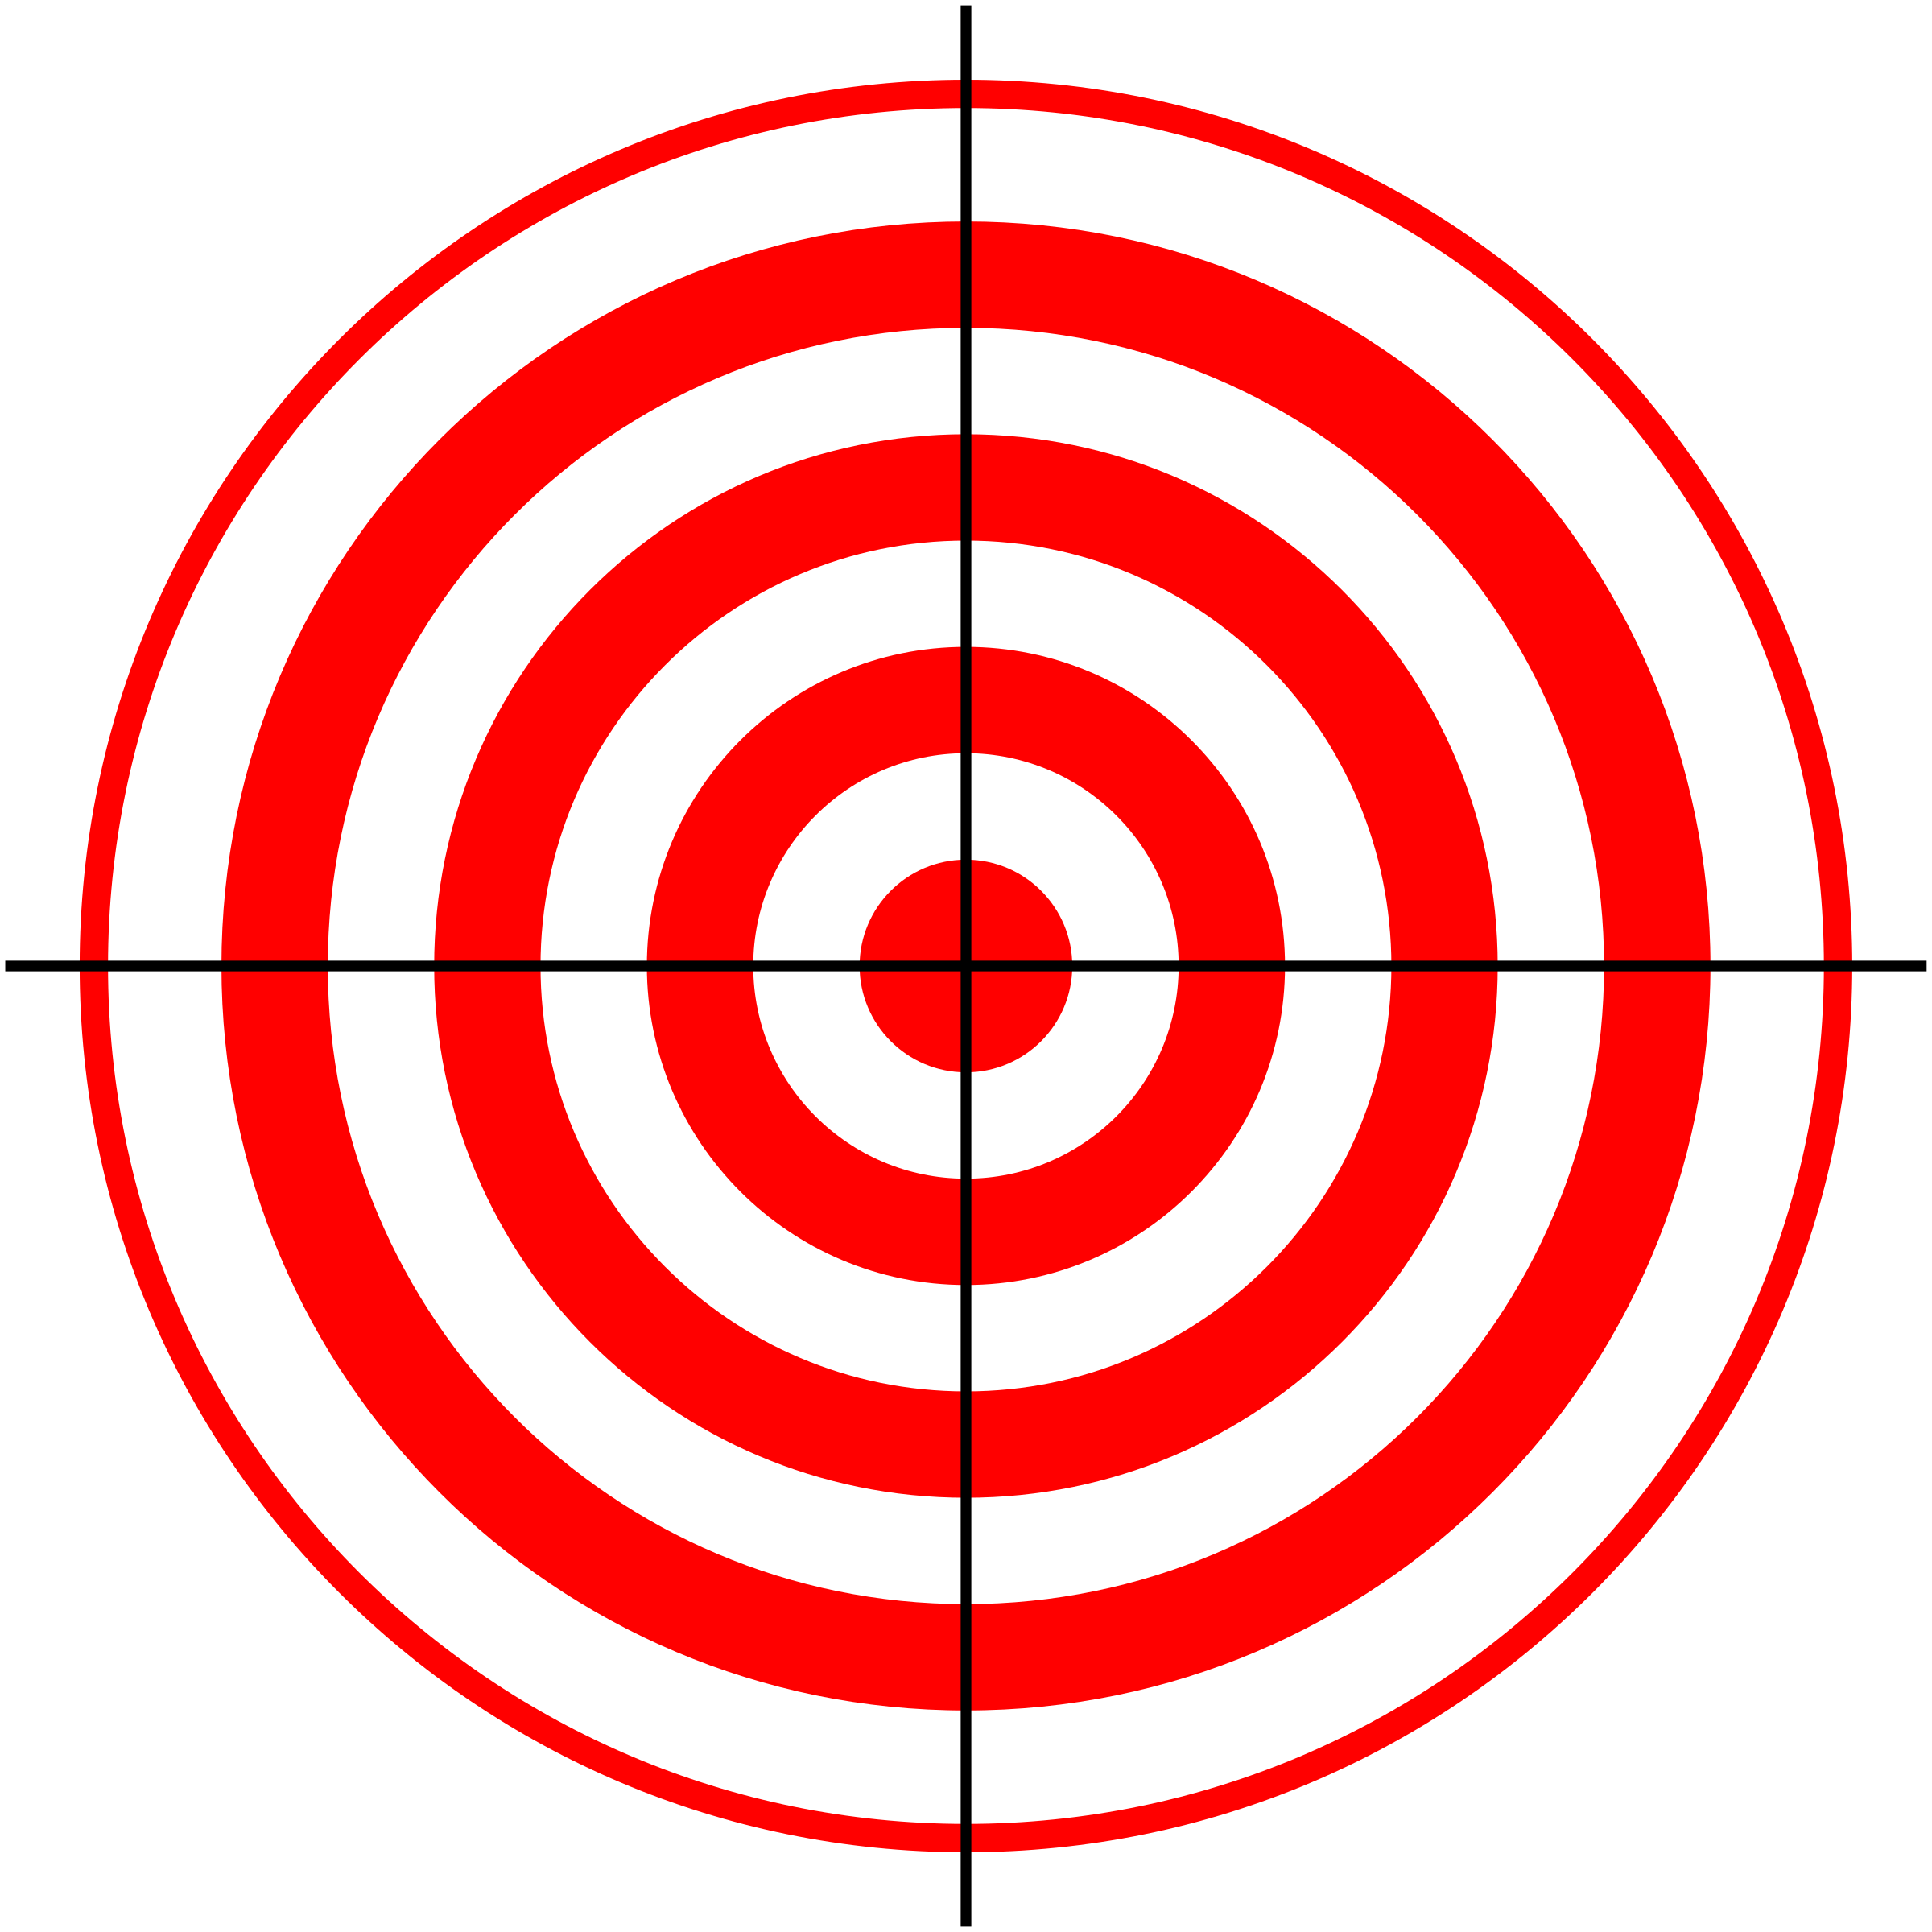 jpg library stock Free png transparent images. Bullseye clipart target gun.